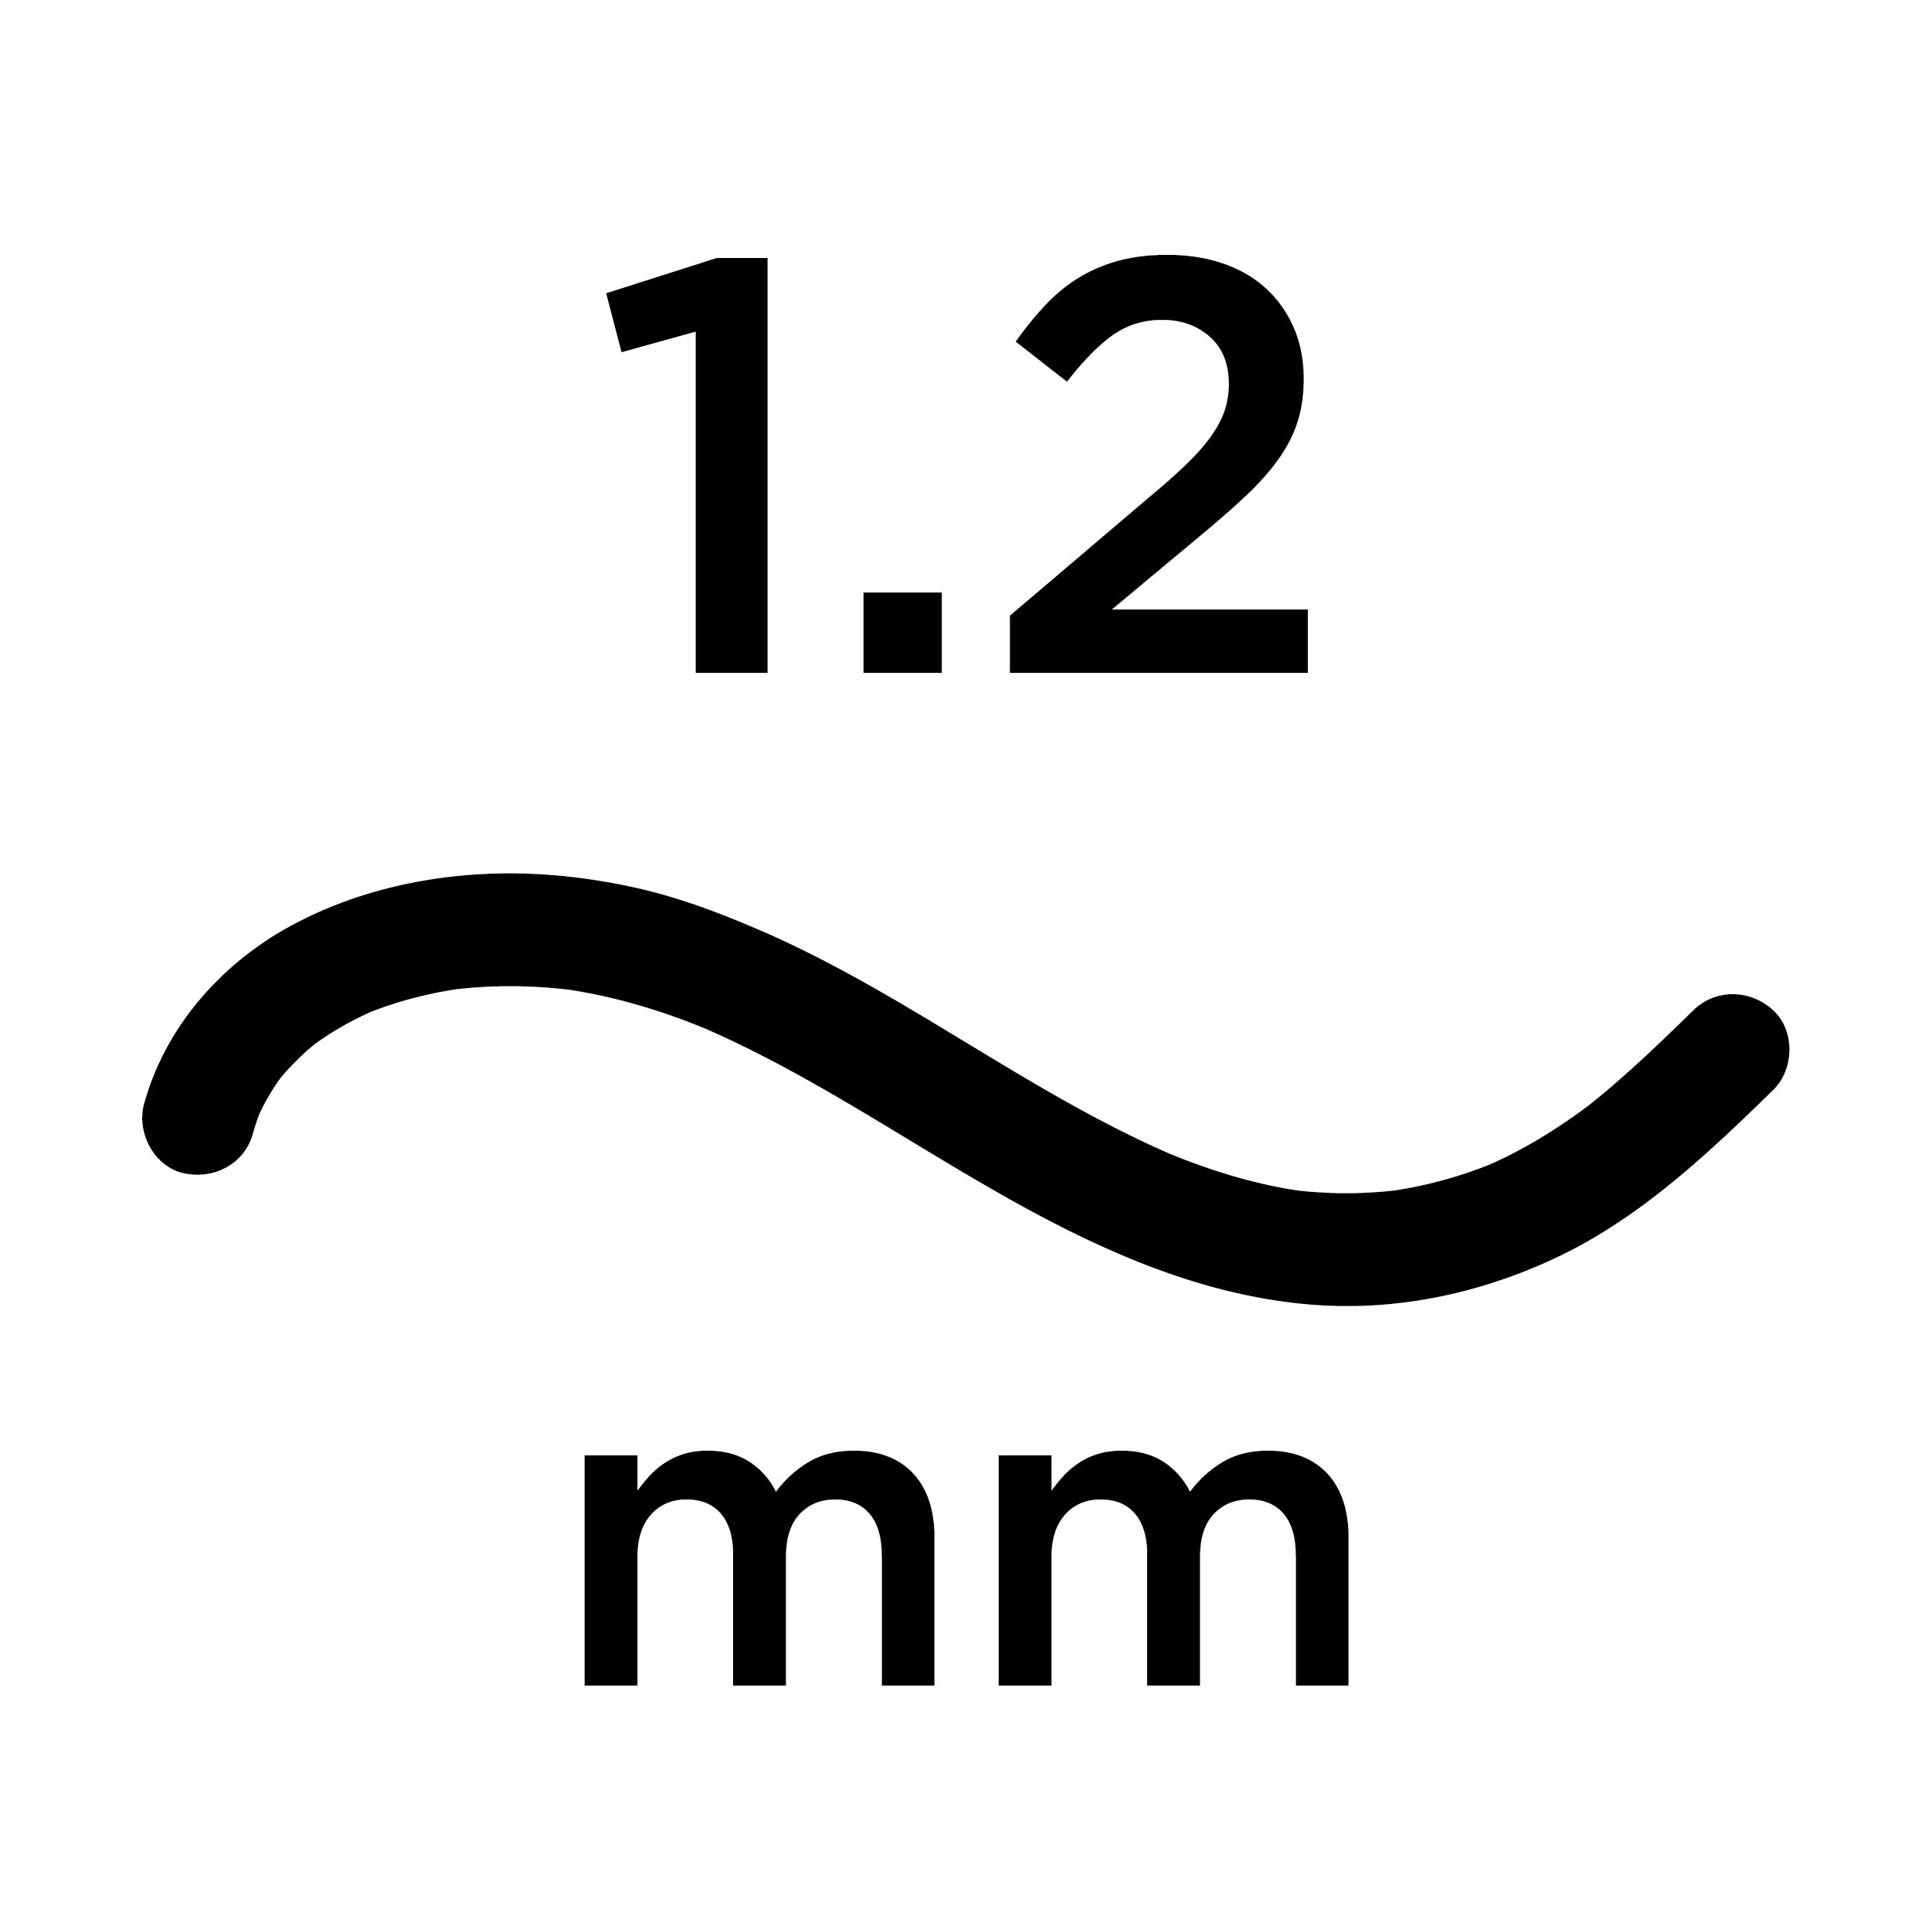 1.2mm